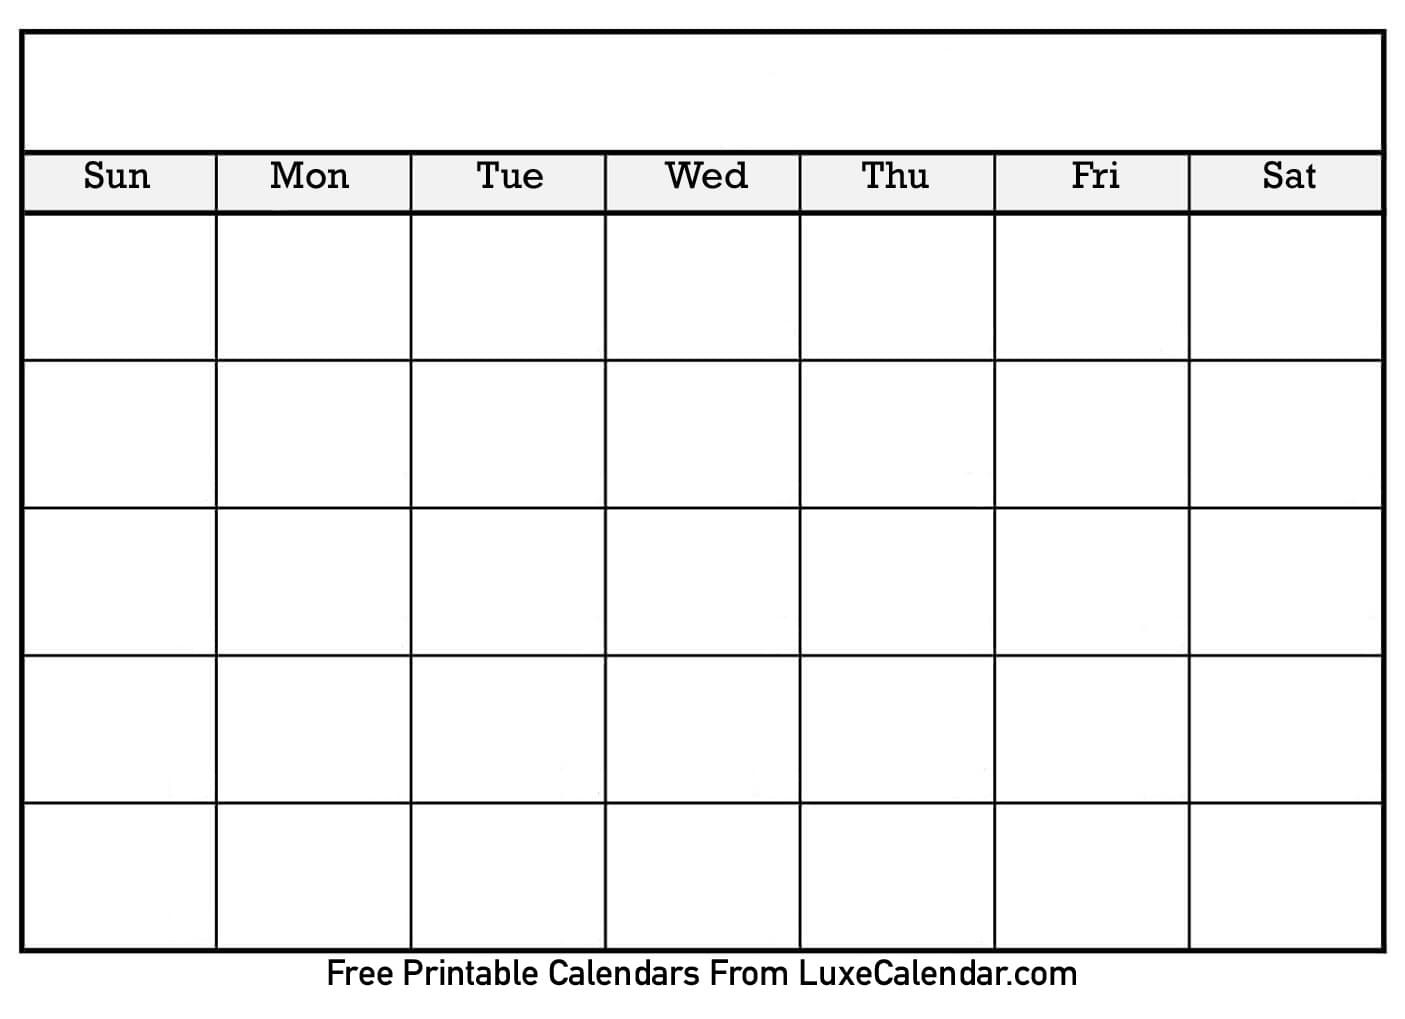 Blank Printable Calendar - Luxe Calendar-Printable Blank Monthly Calendar Template